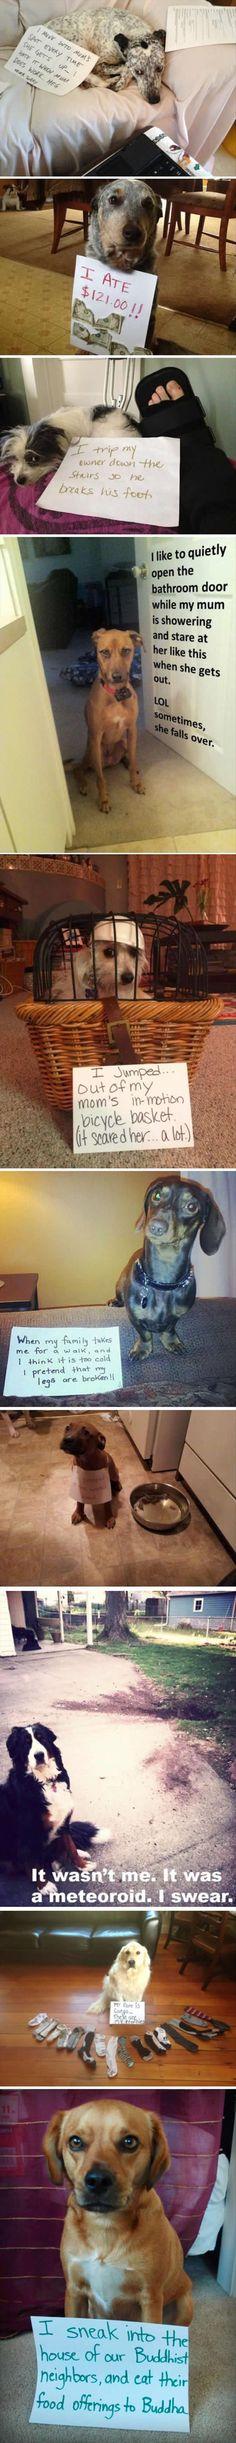 Dog shaming makes me smile